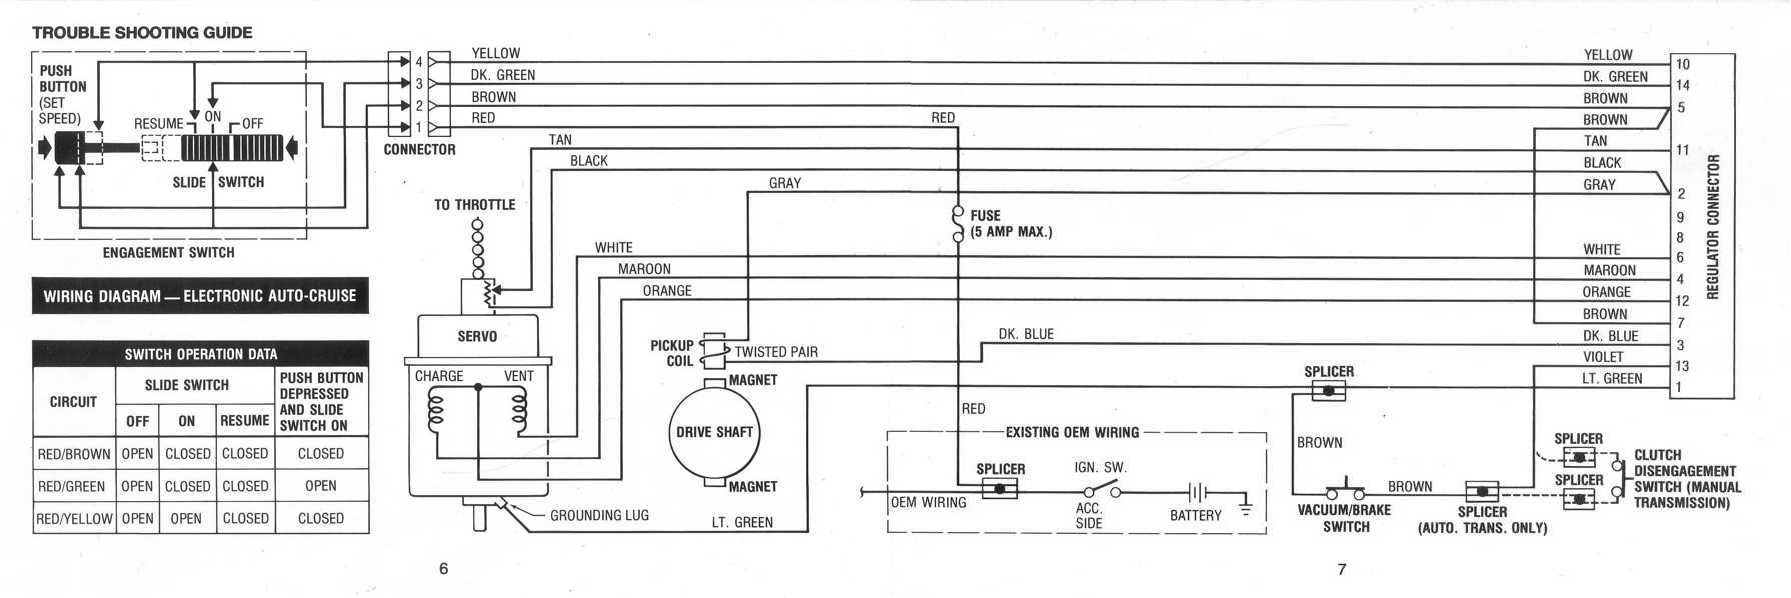 wiring diagram for zig cf9 \\u0026 hd wallpapers wiring diagram for zig zig cf9 wiring